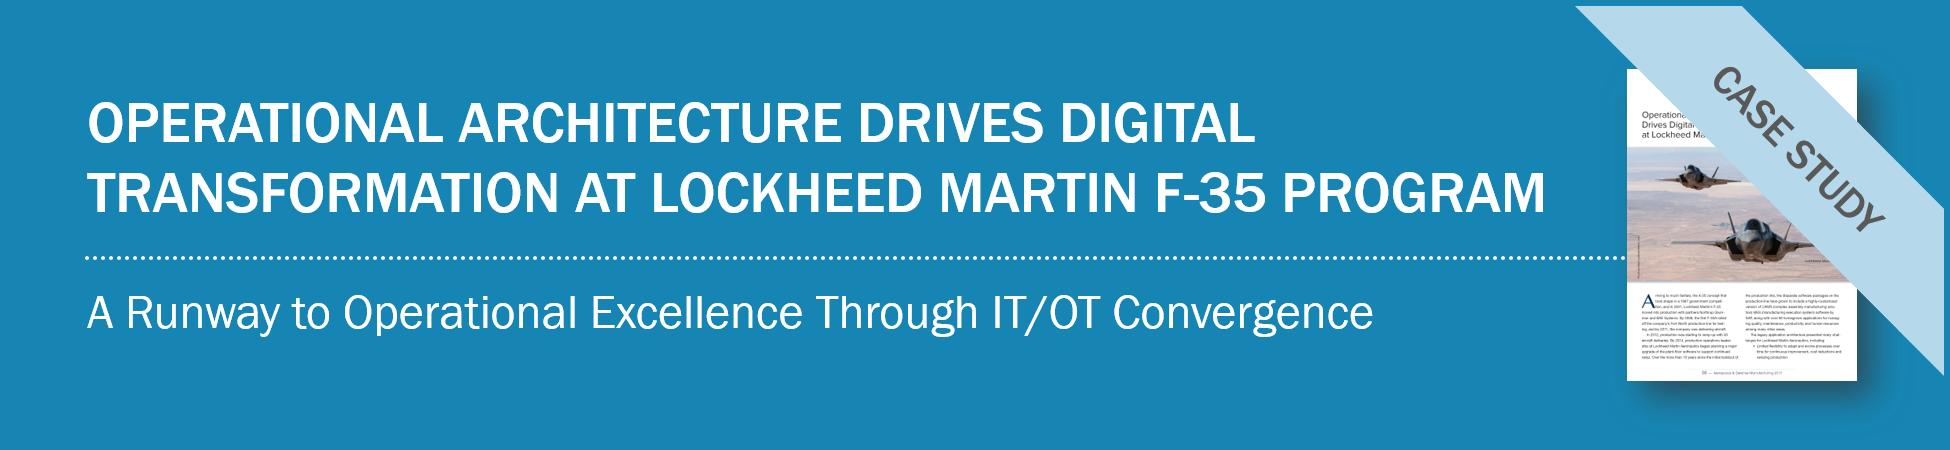 Operational Architecture Drives Digital Transformation at Lockheed Martin F-35 Program